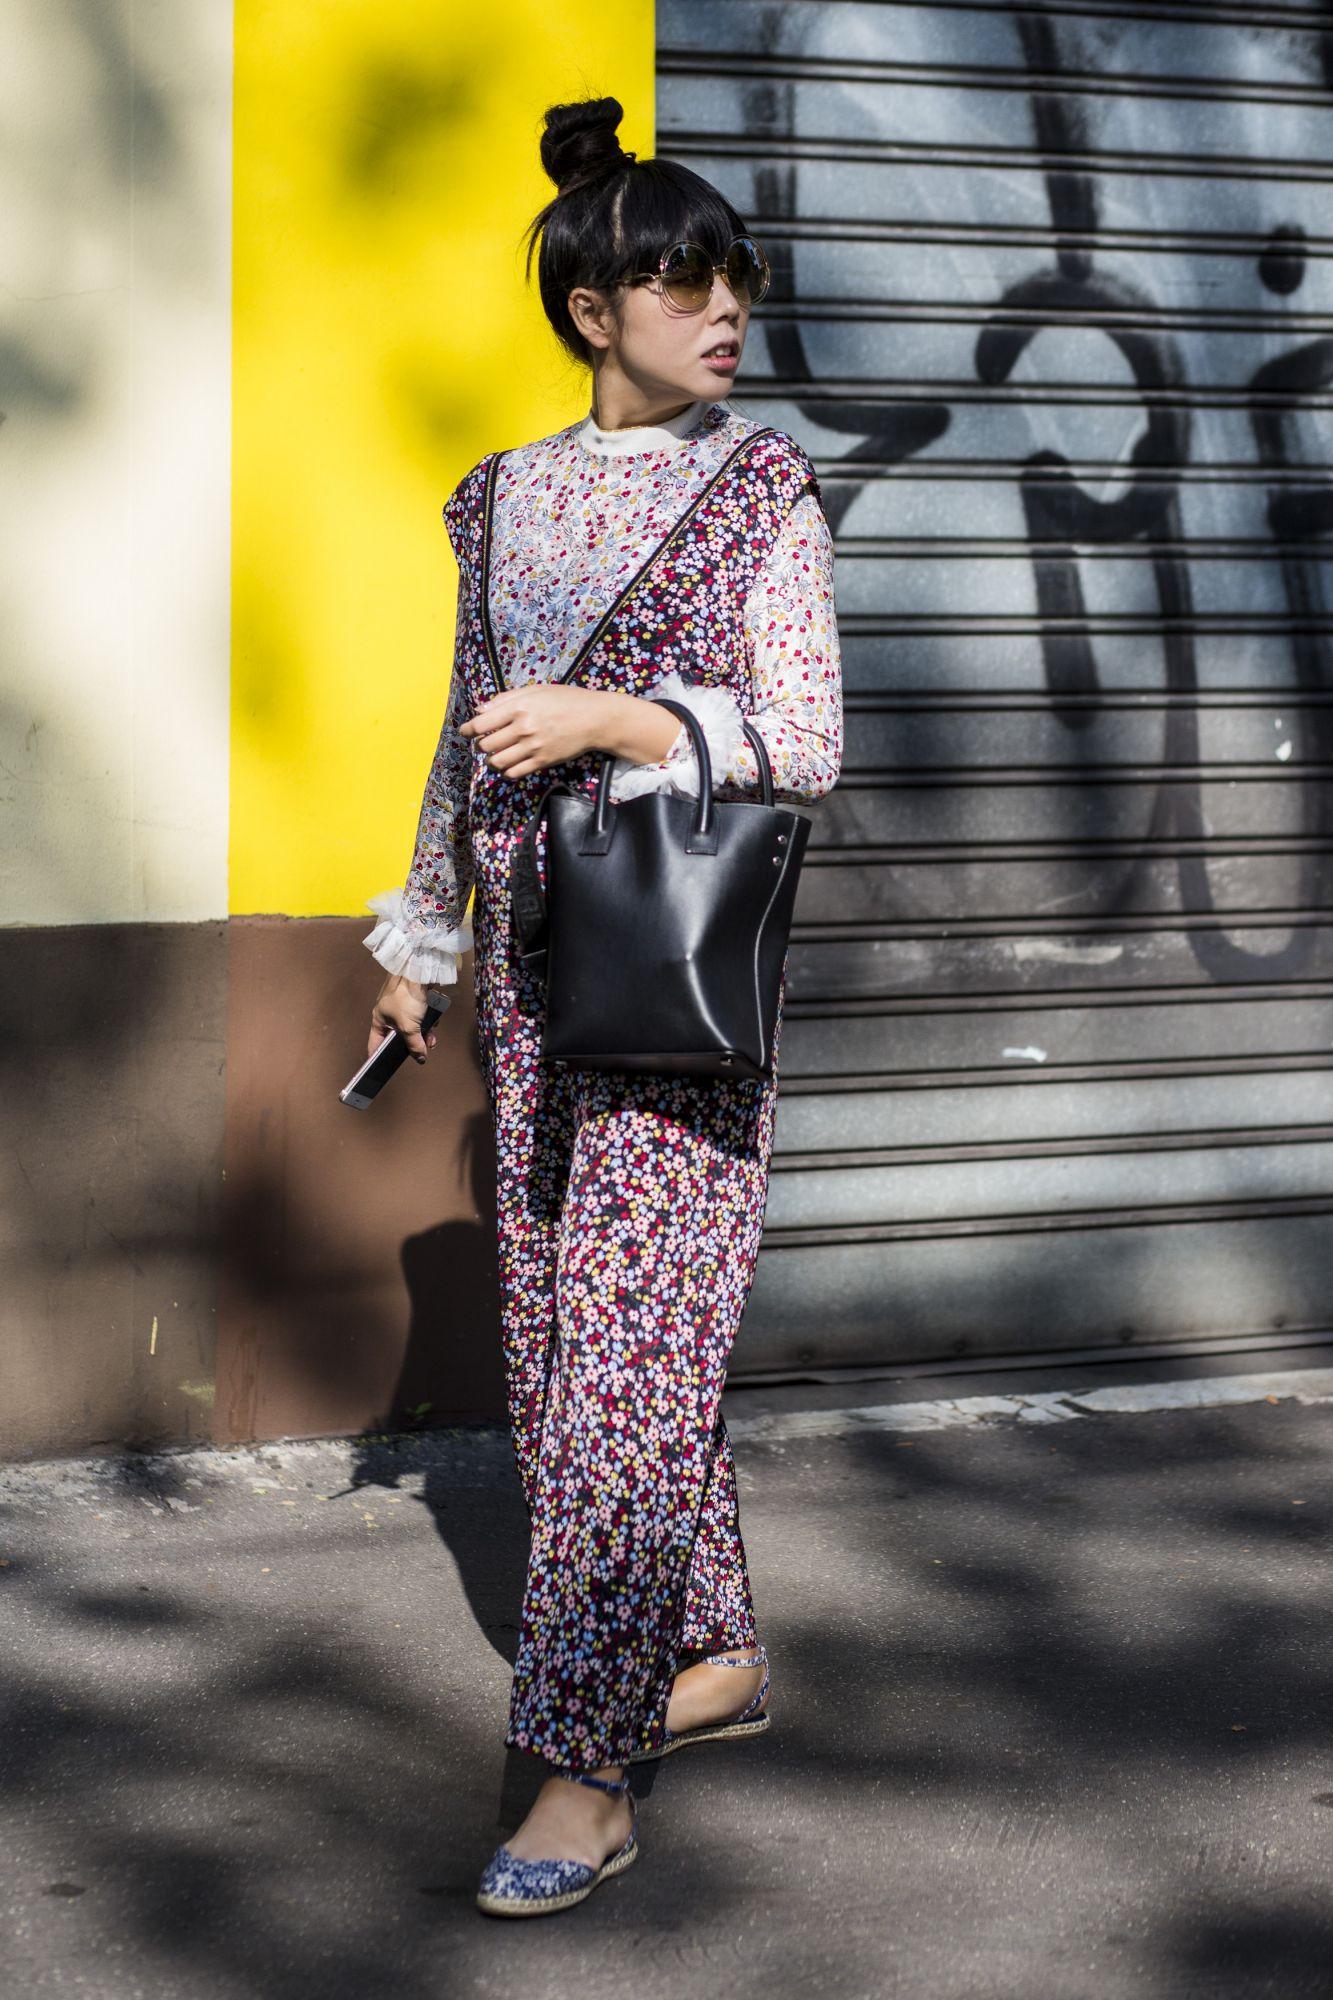 Fashion Asia: 5 Minutes With Susie 'Bubble' Lau